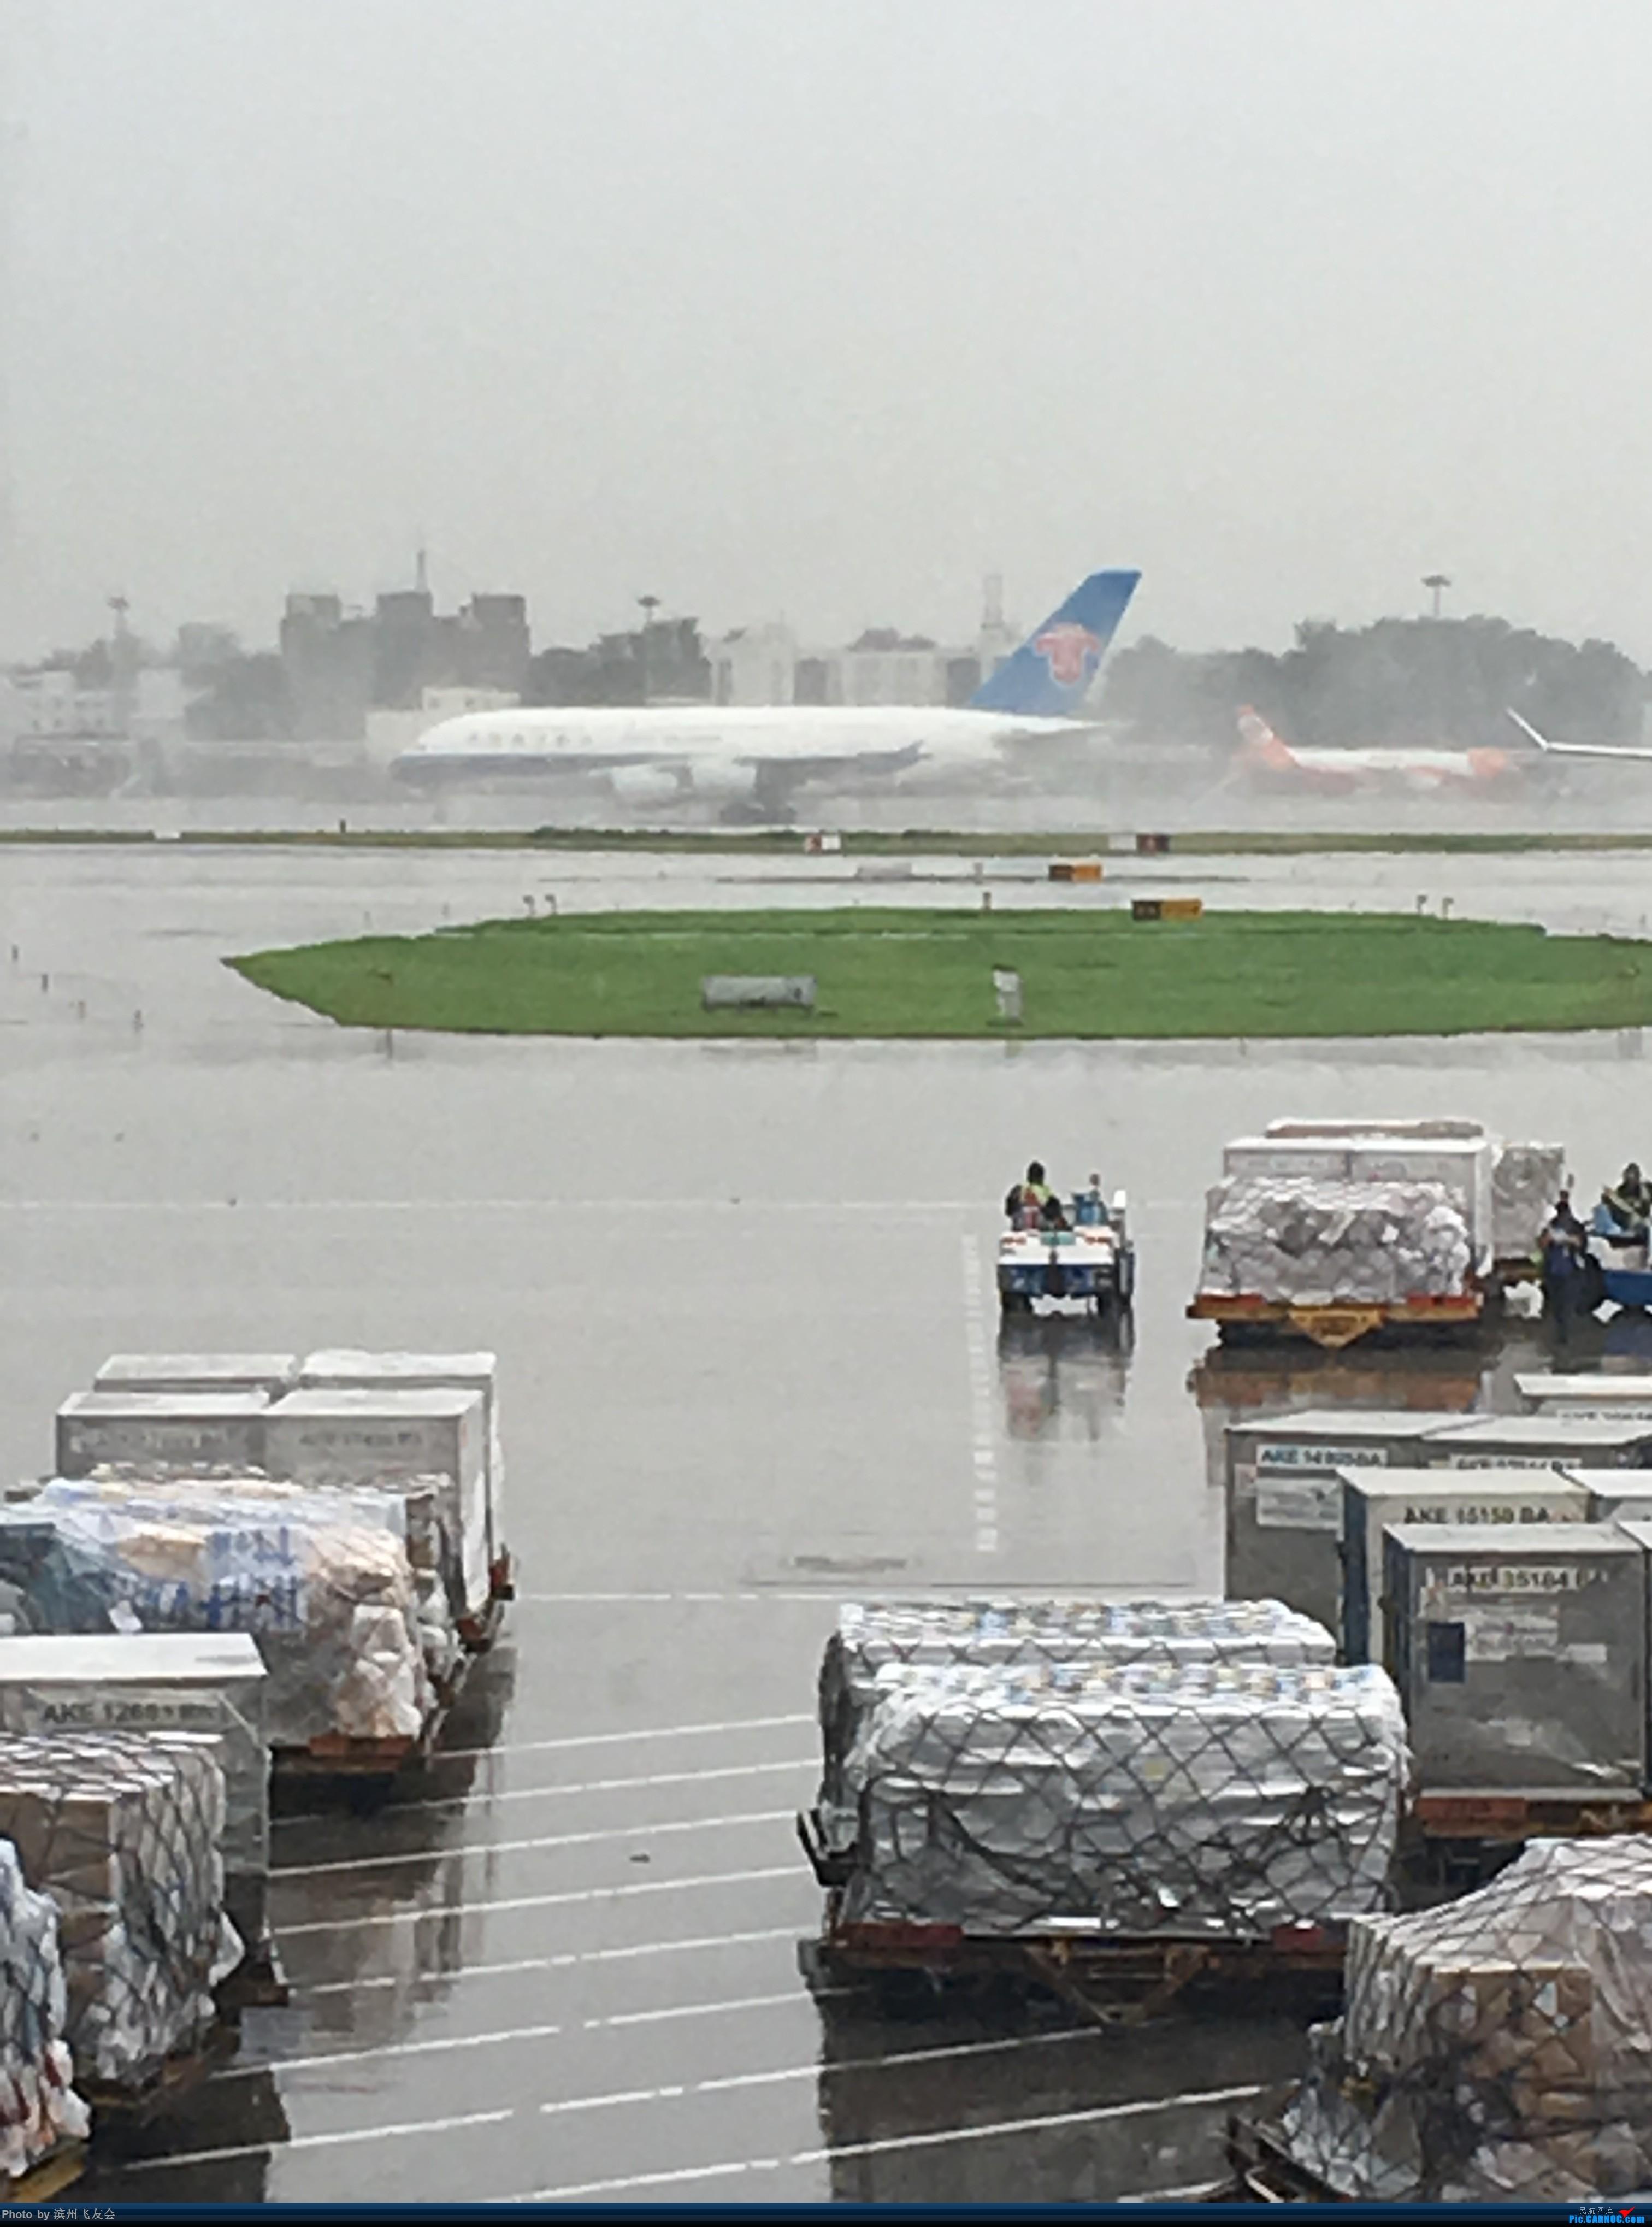 Re:[原创]~骚年飞行篇~补充半年前的香港之路,国航CA111 PEK-HKG,有幸坐到大擦第50架77W AIRBUS A380 B-6137 中国北京首都国际机场